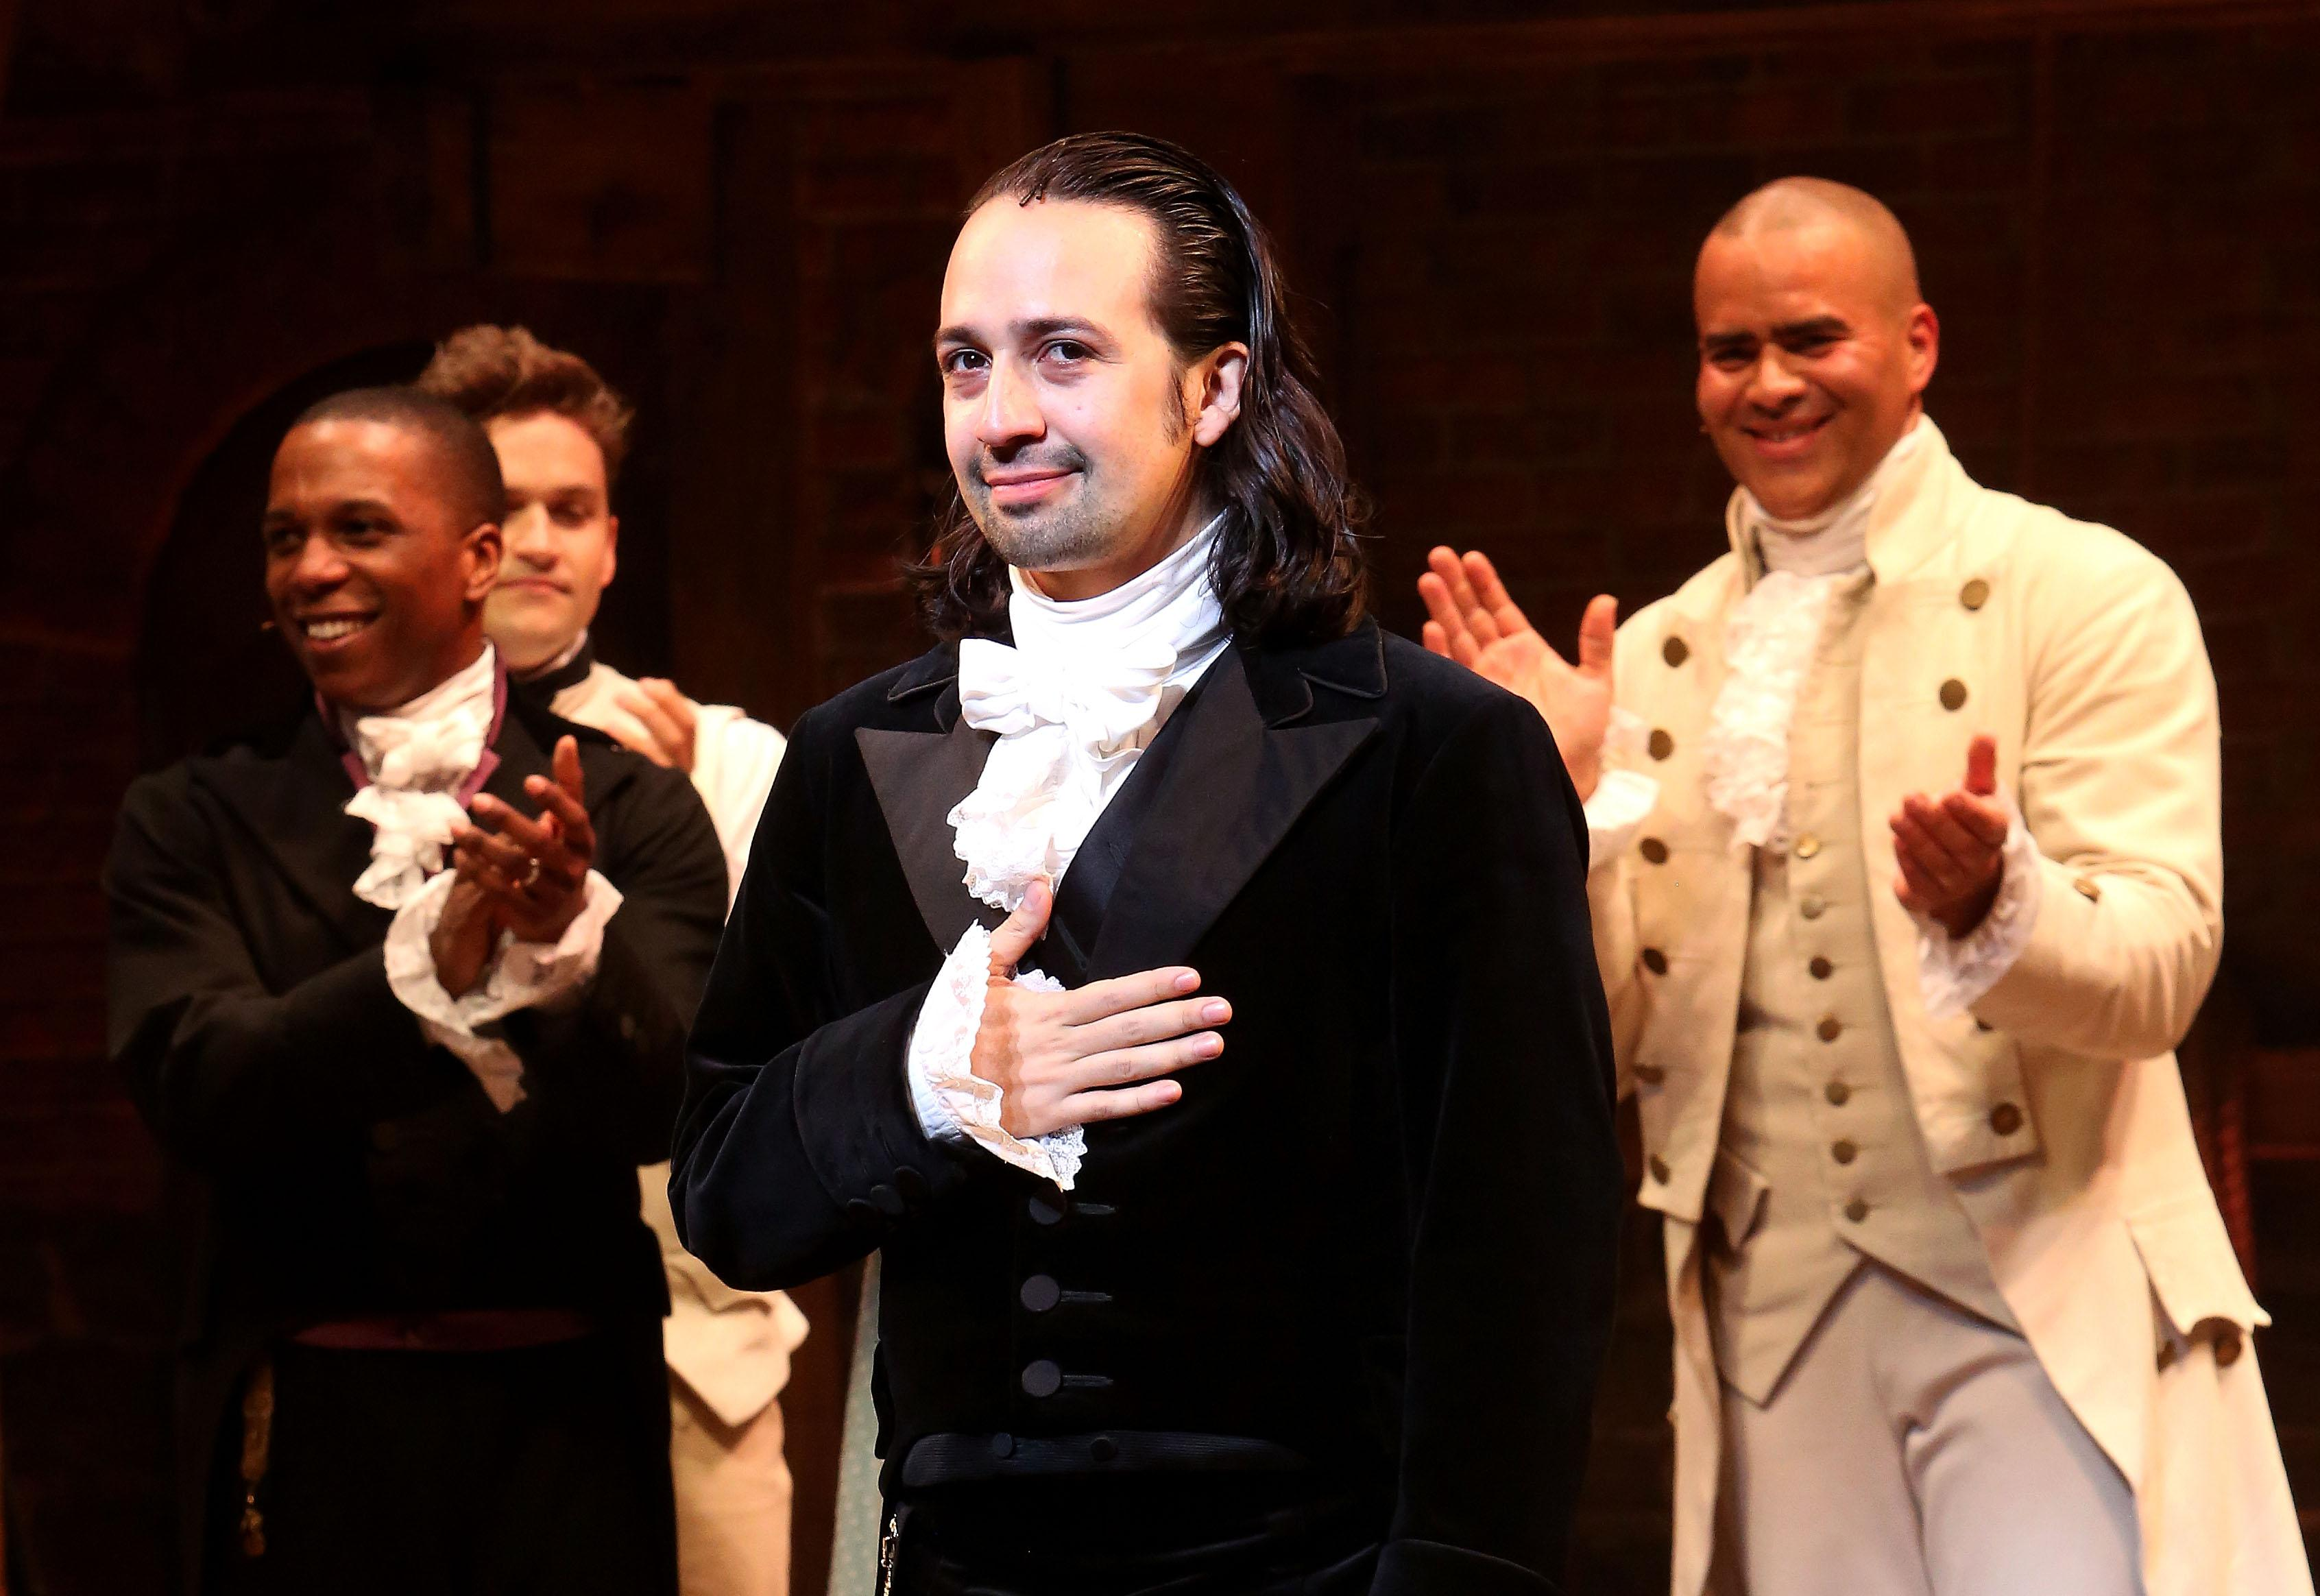 Disney pays a historic £57.6 million to release 'Hamilton' performance as a movie